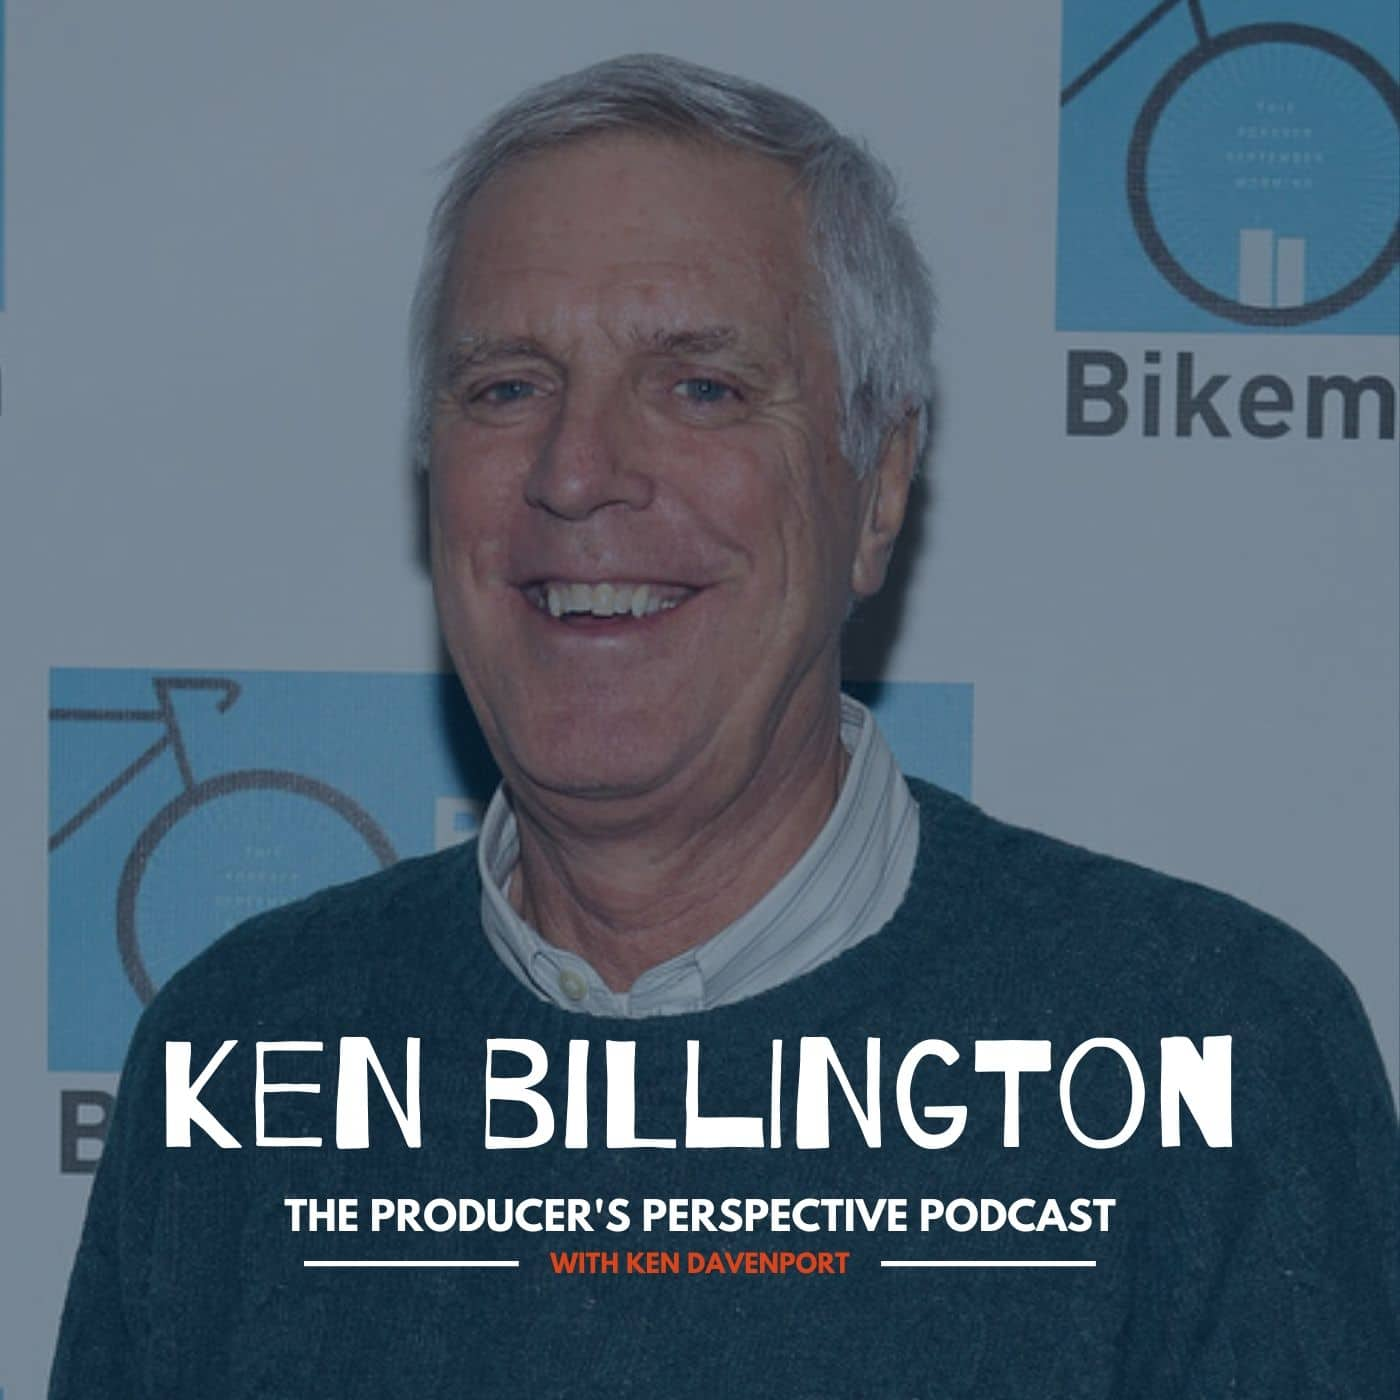 Ken Davenport's The Producer's Perspective Podcast Episode 56 - Ken Billington